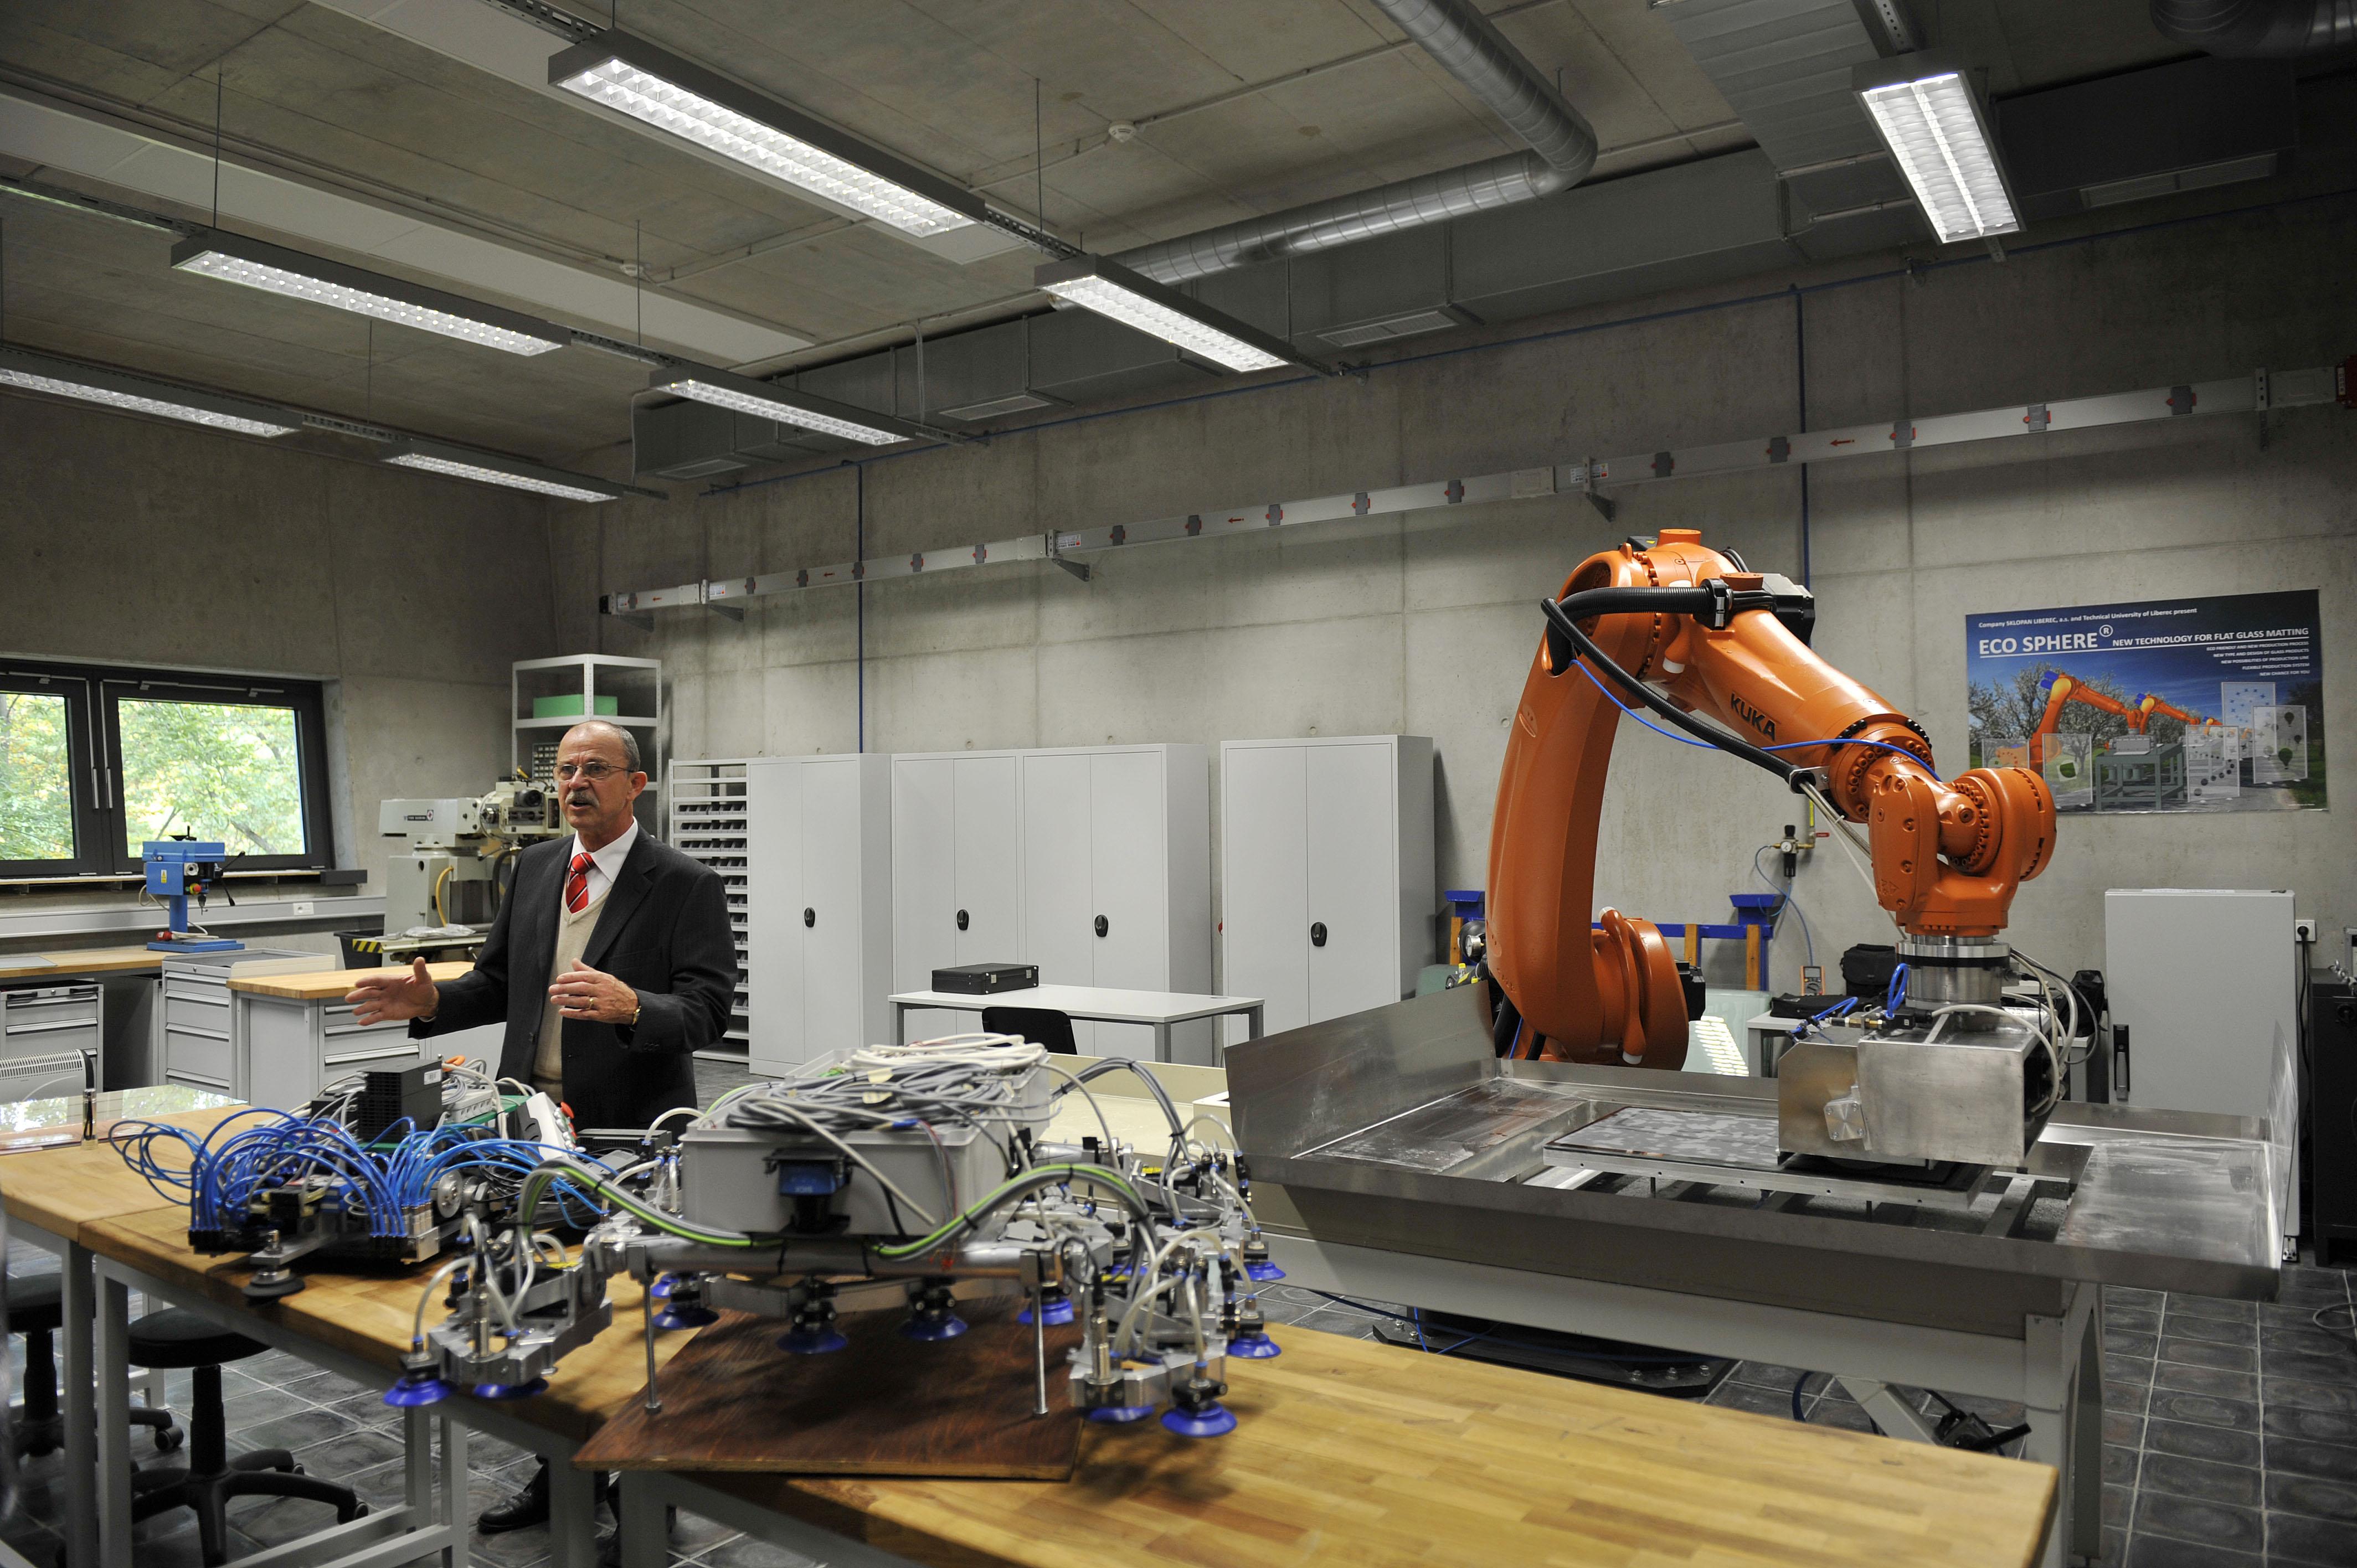 Researches intelligent robotics amp mechatronic system laboratory - Laboratory Of Robotics